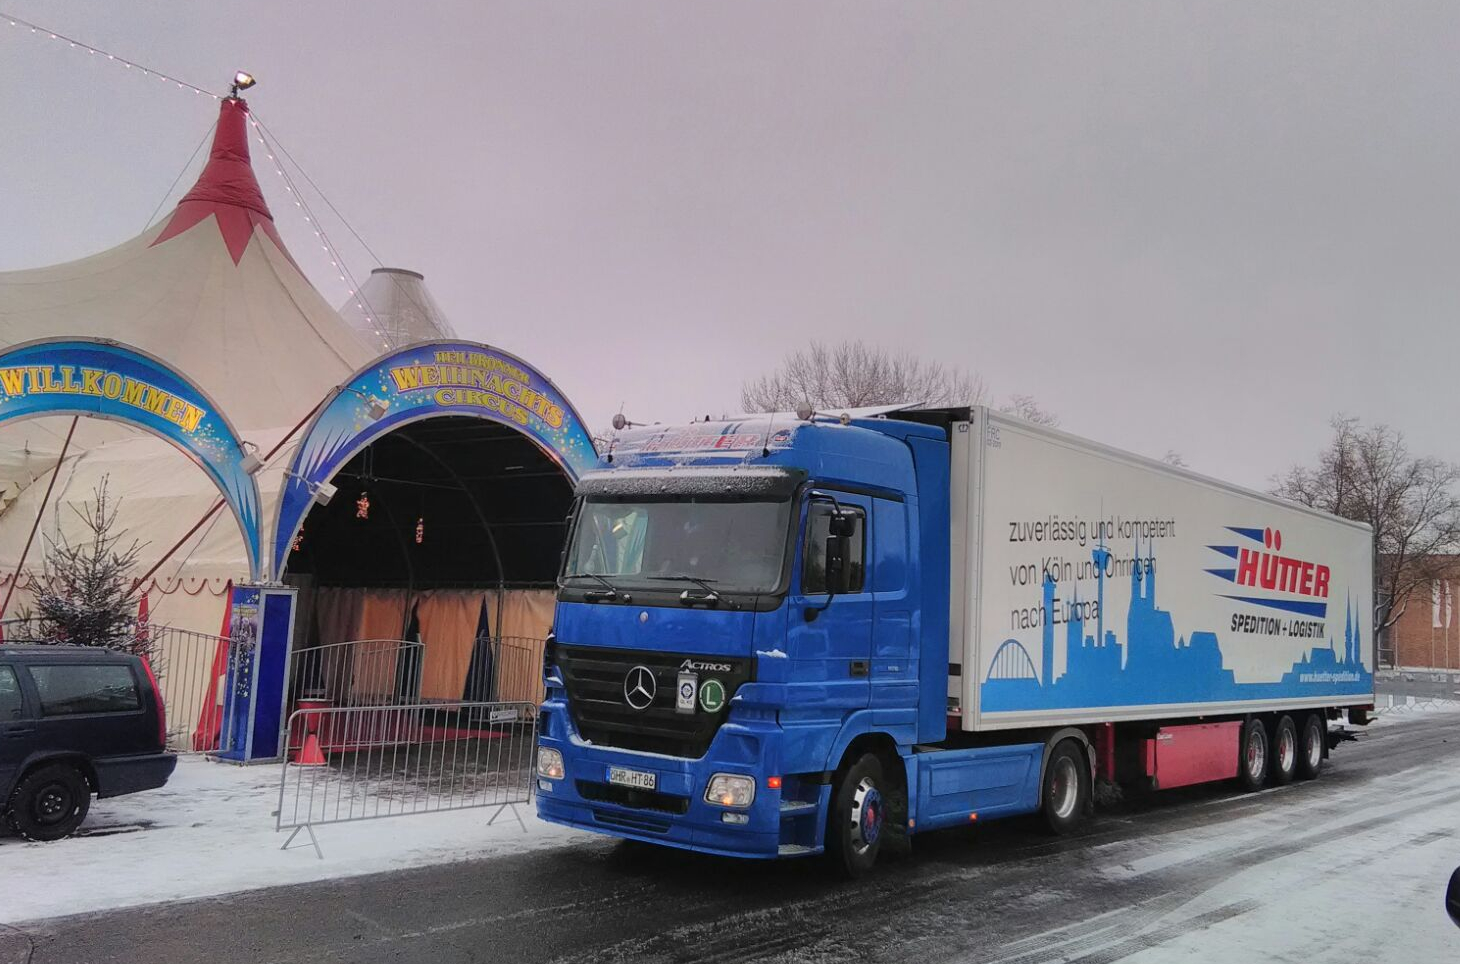 Hütter Zirkuspalast 2017